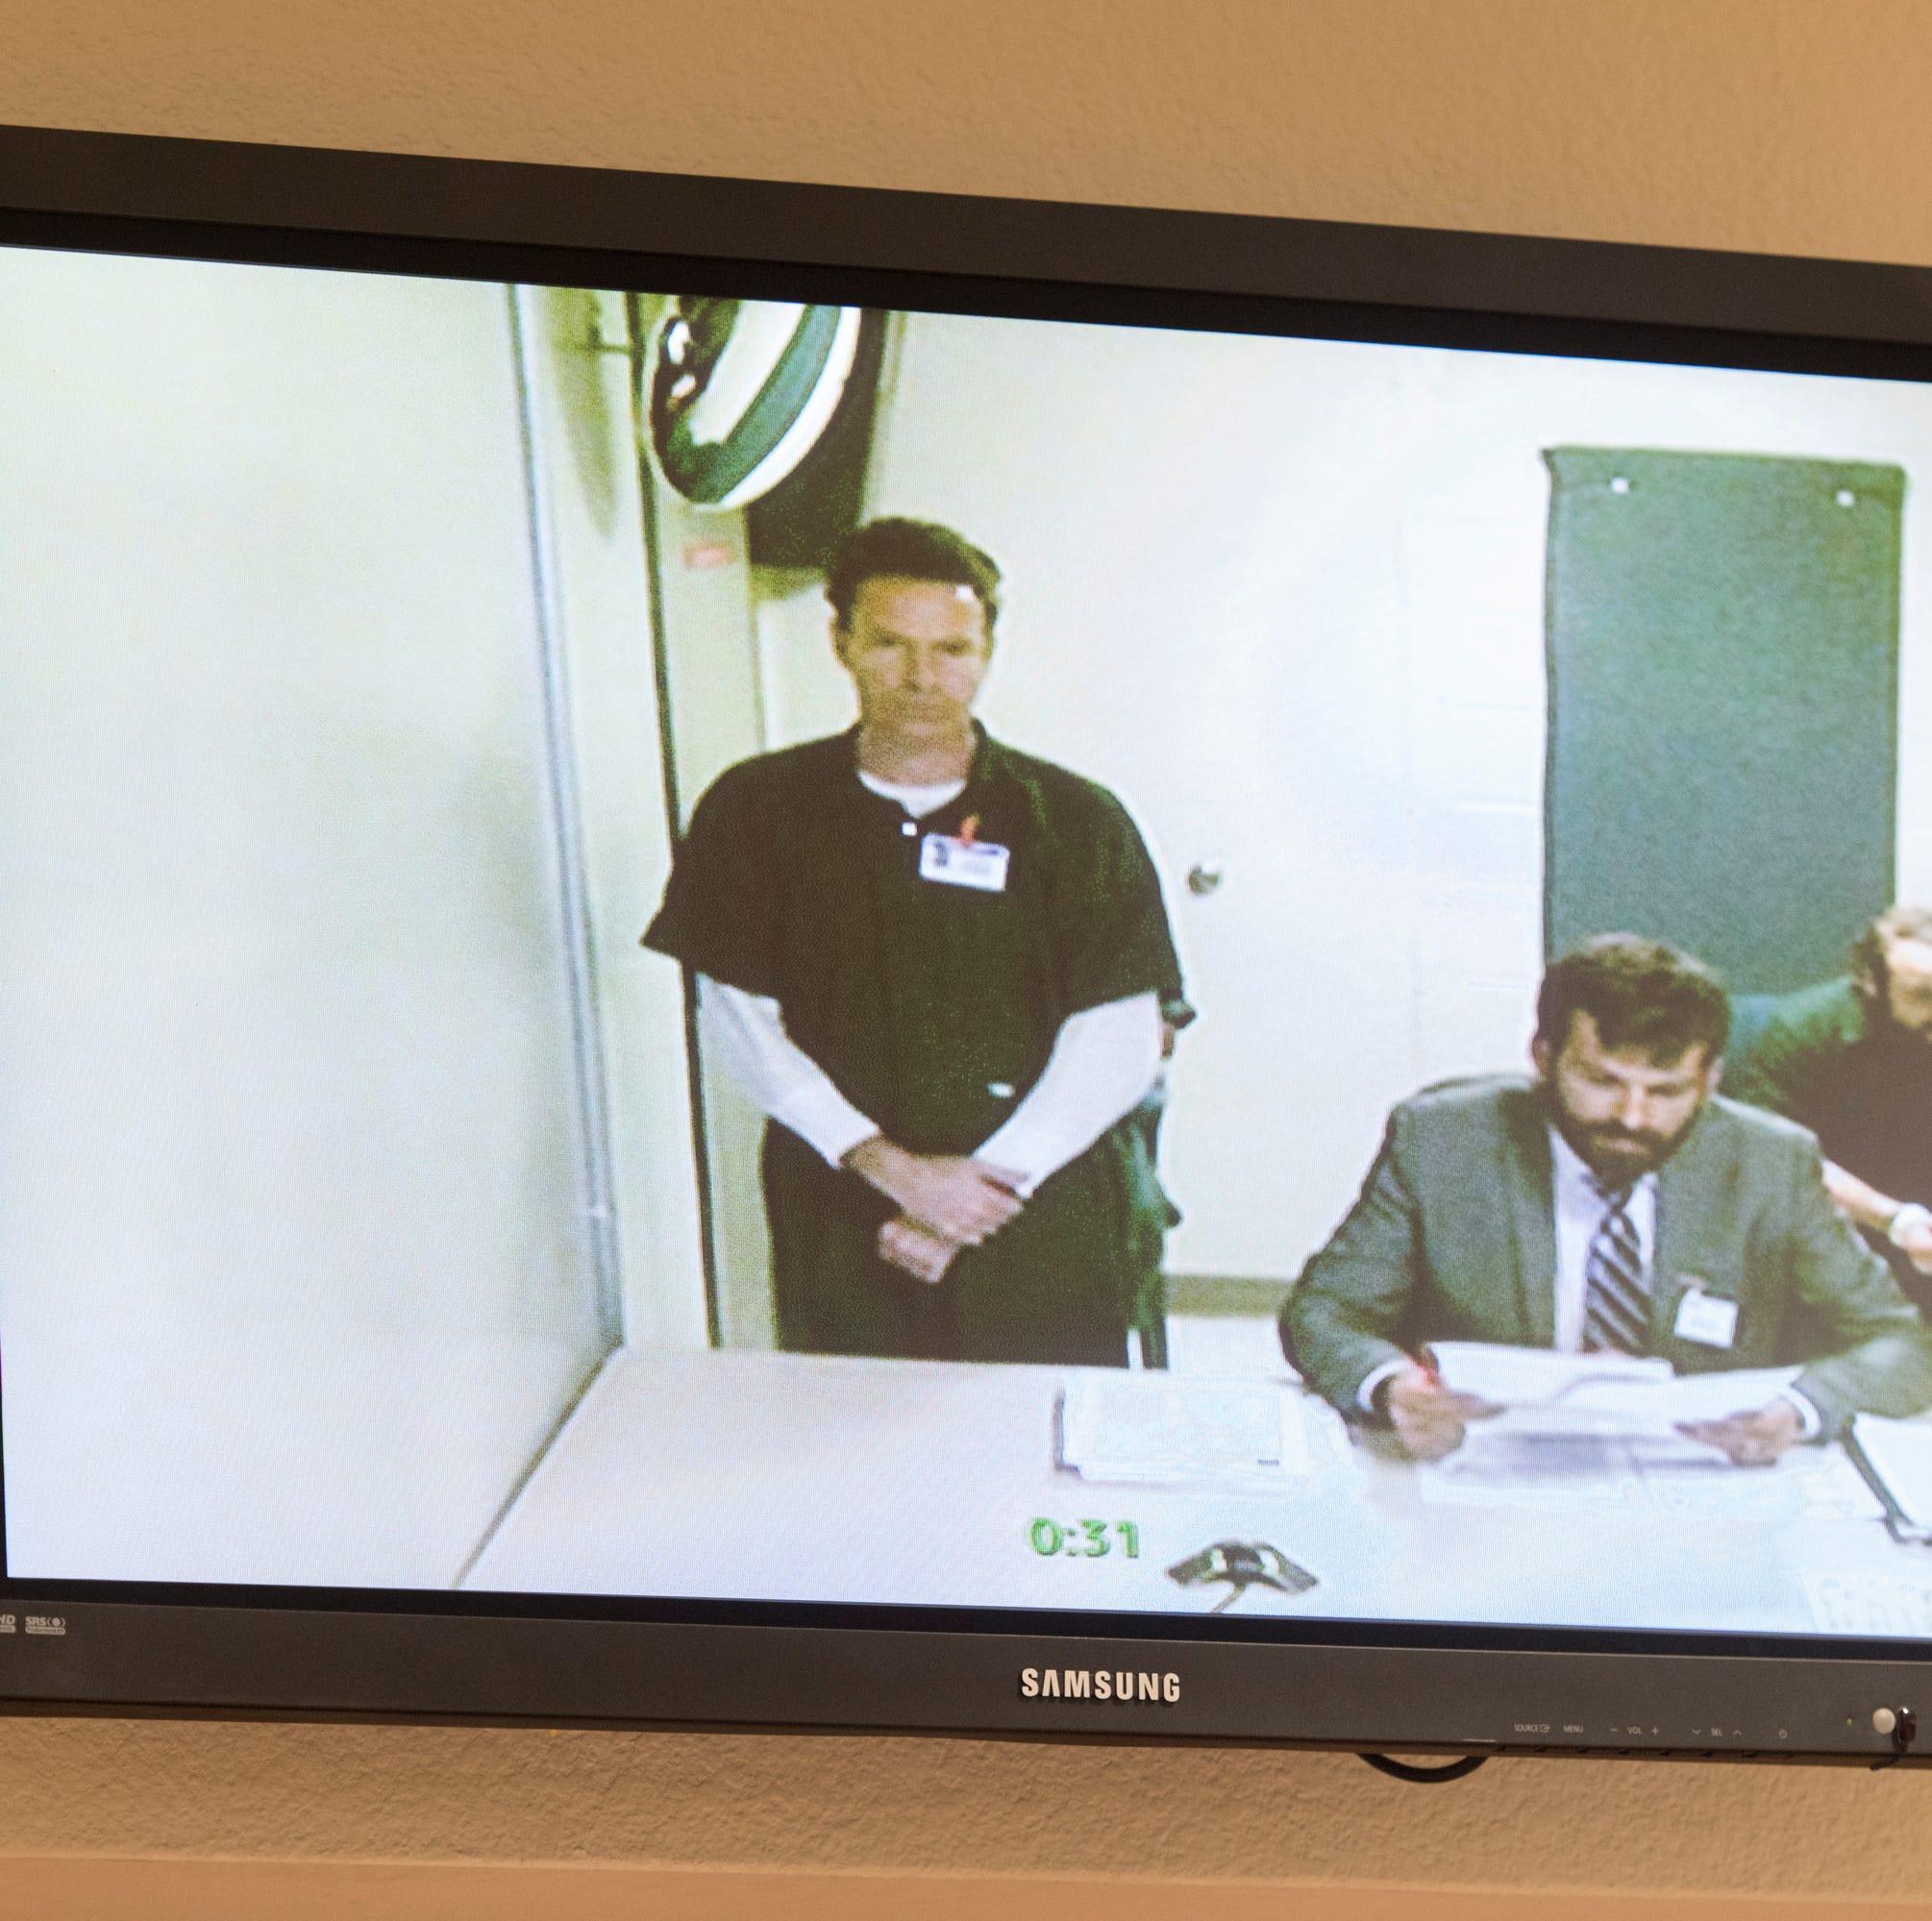 Cassandra Robinson case: Judge denies bond for accused killer Henry Steiger